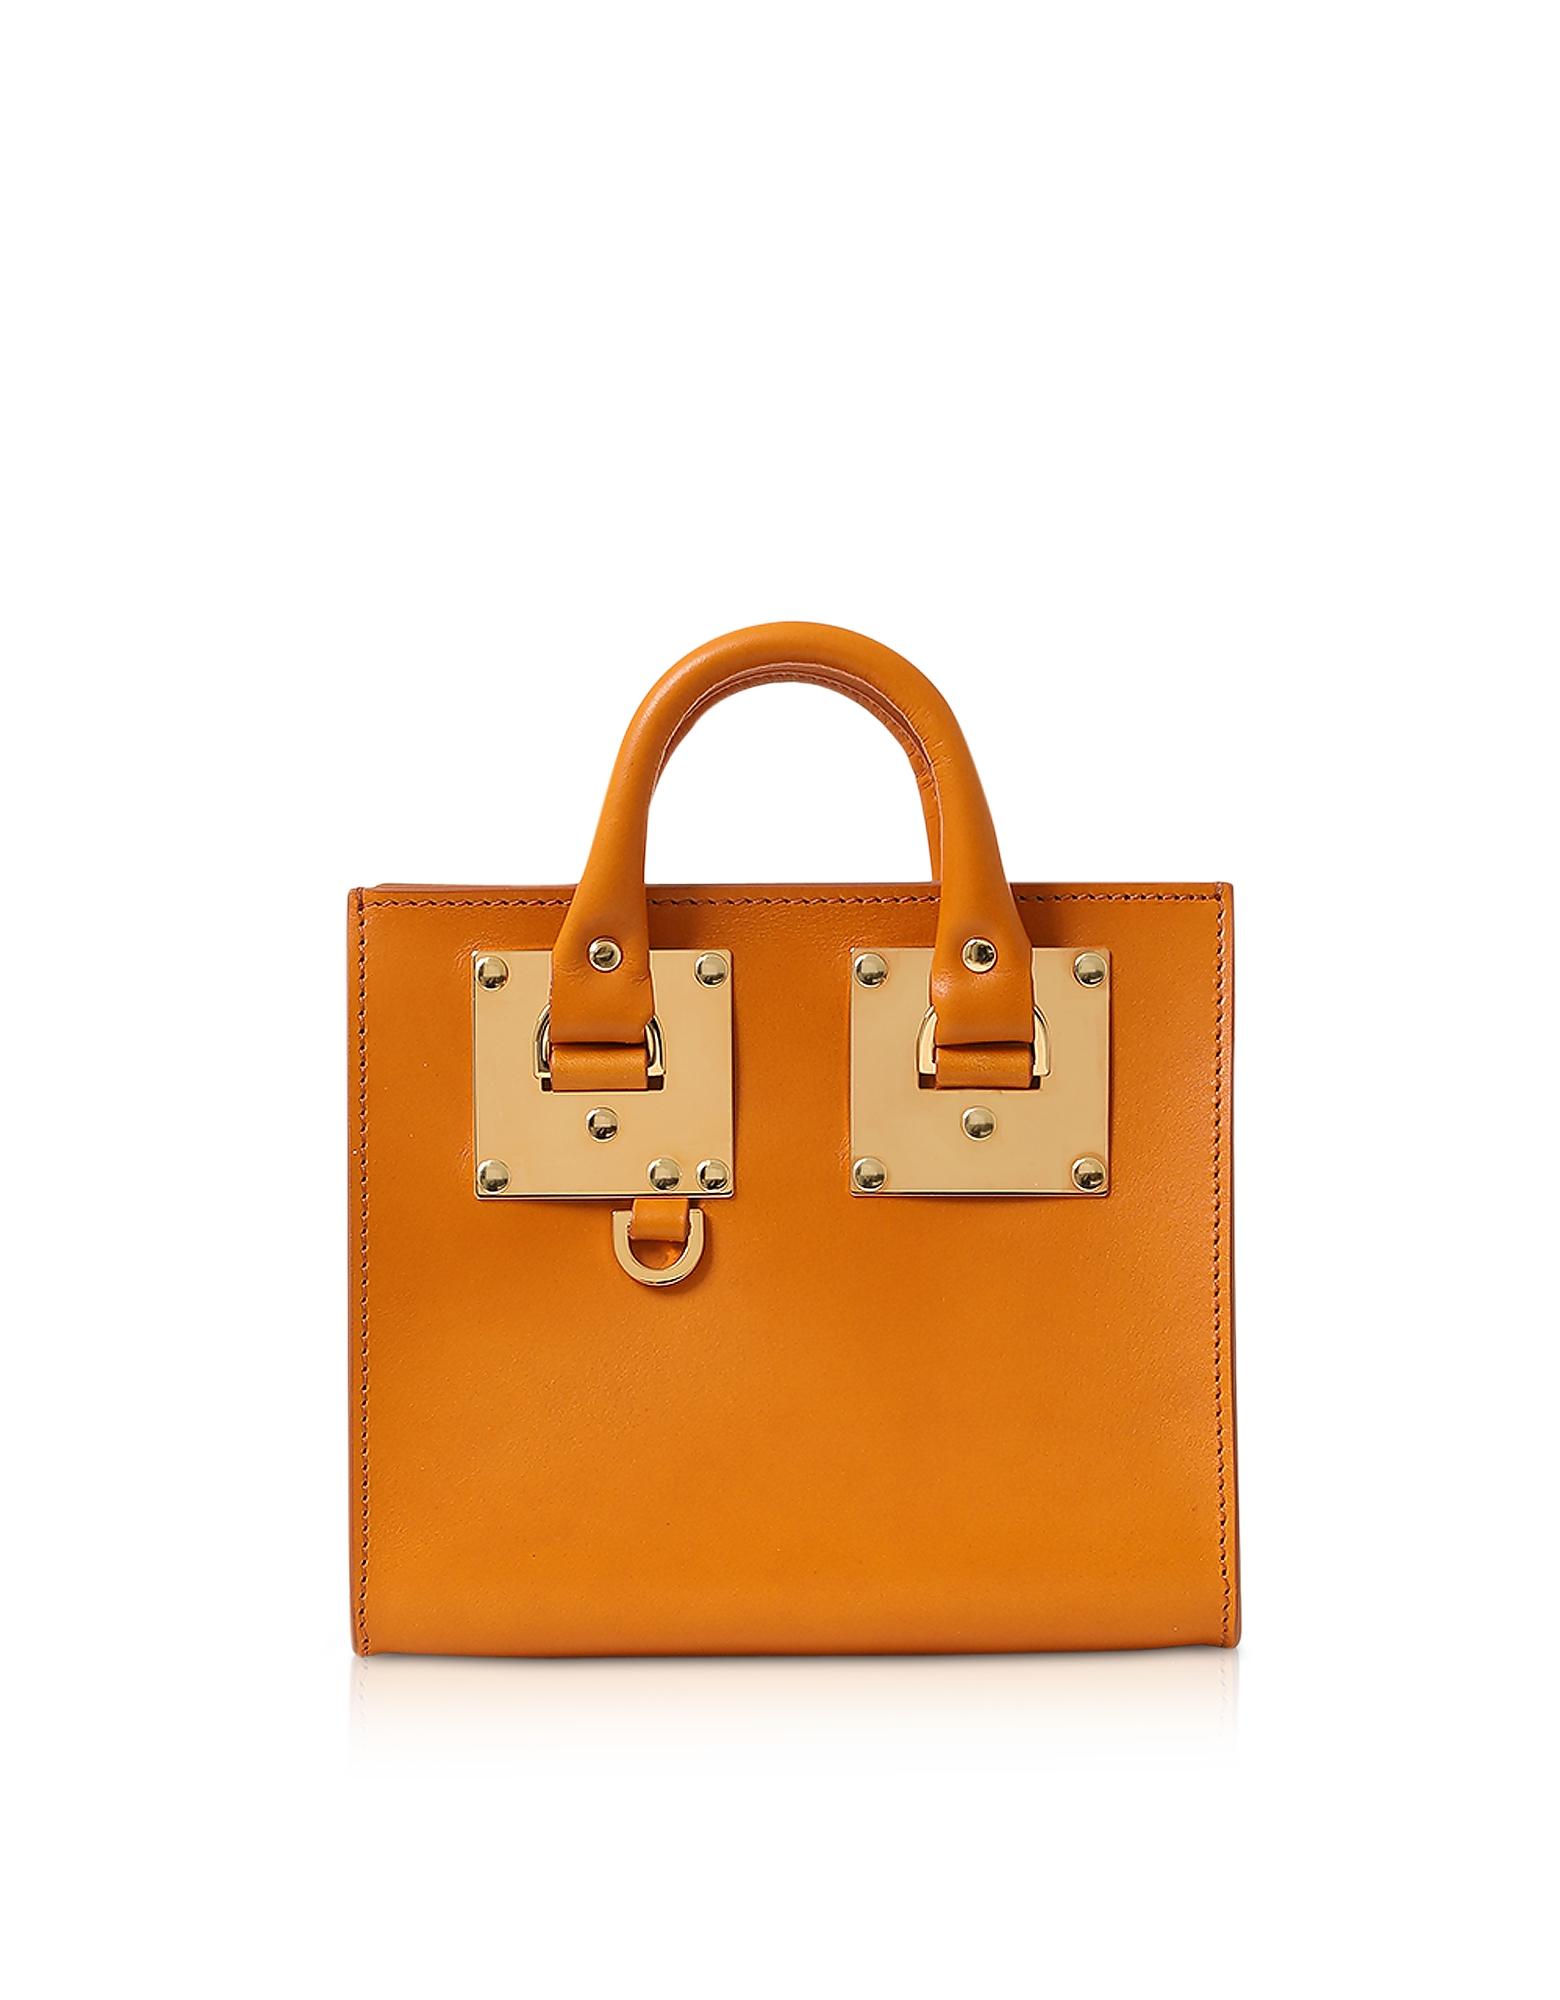 SOPHIE HULME | Sophie Hulme Designer Handbags, Shiny Saddle Leather Box Albion Tote | Goxip